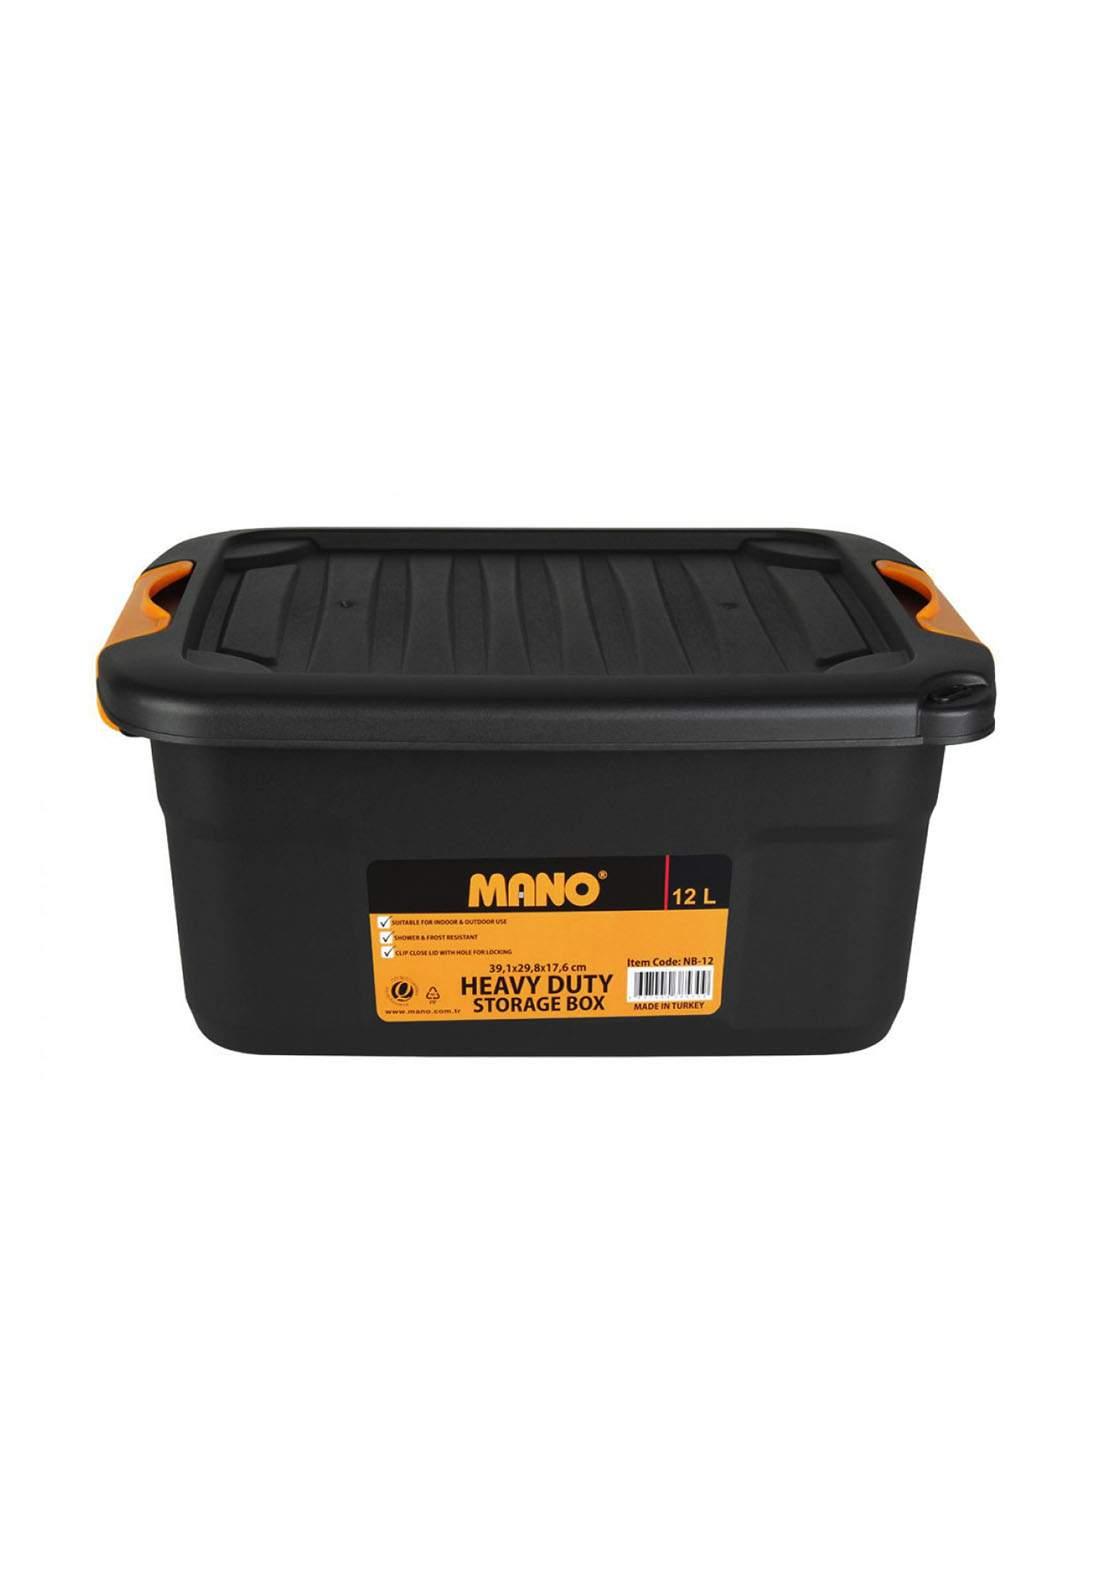 Mano NB-12 Storage Box 12L صندوق تخزين